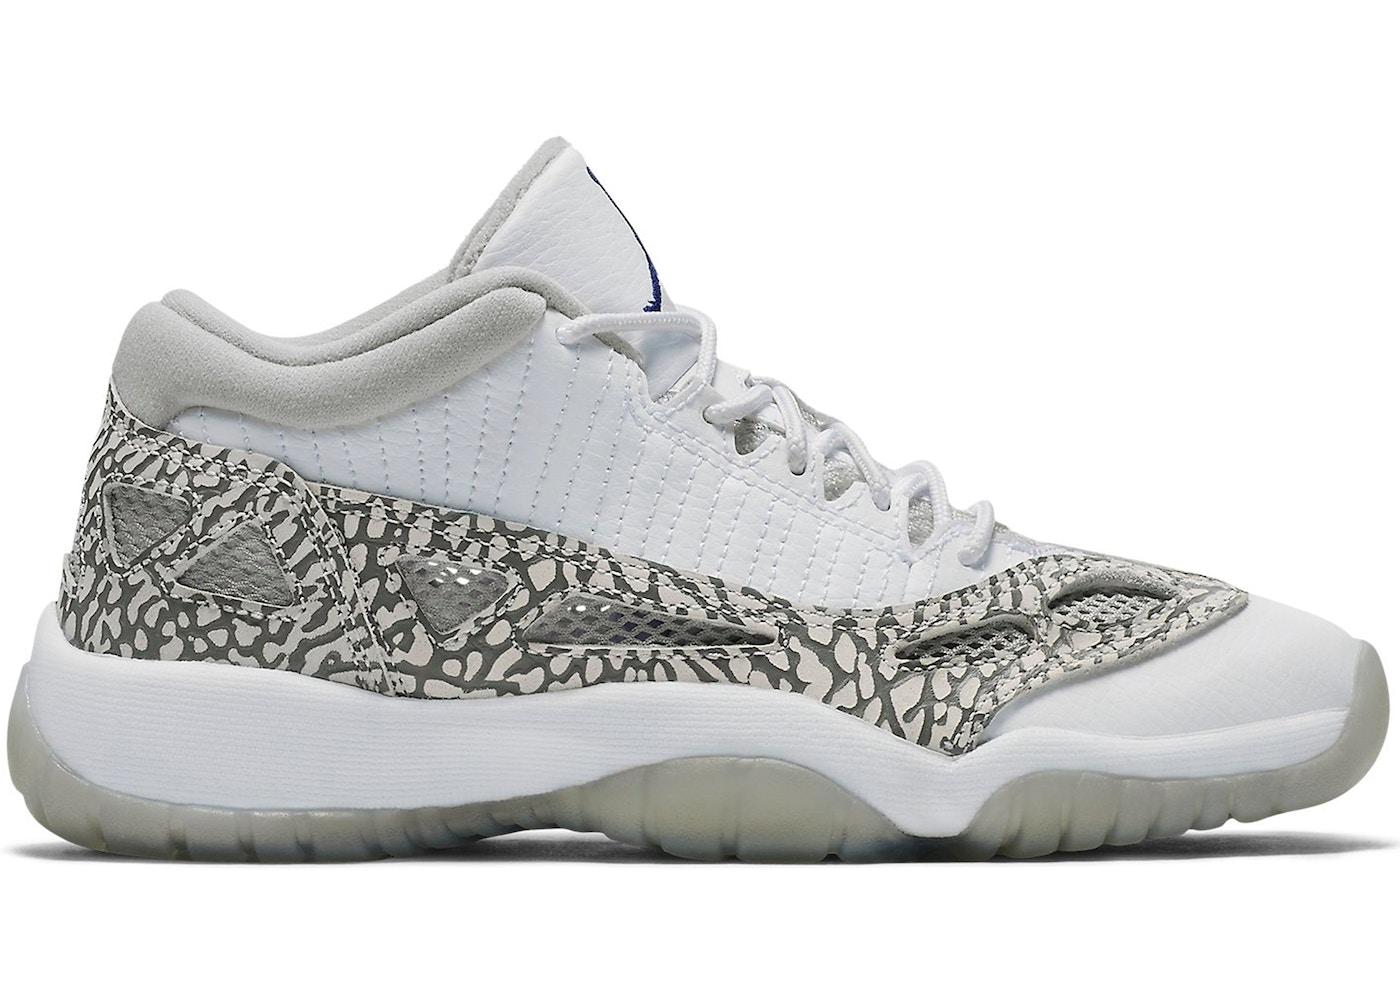 ff2b61b1c0f6 Air Jordan 11 Shoes - Lowest Ask